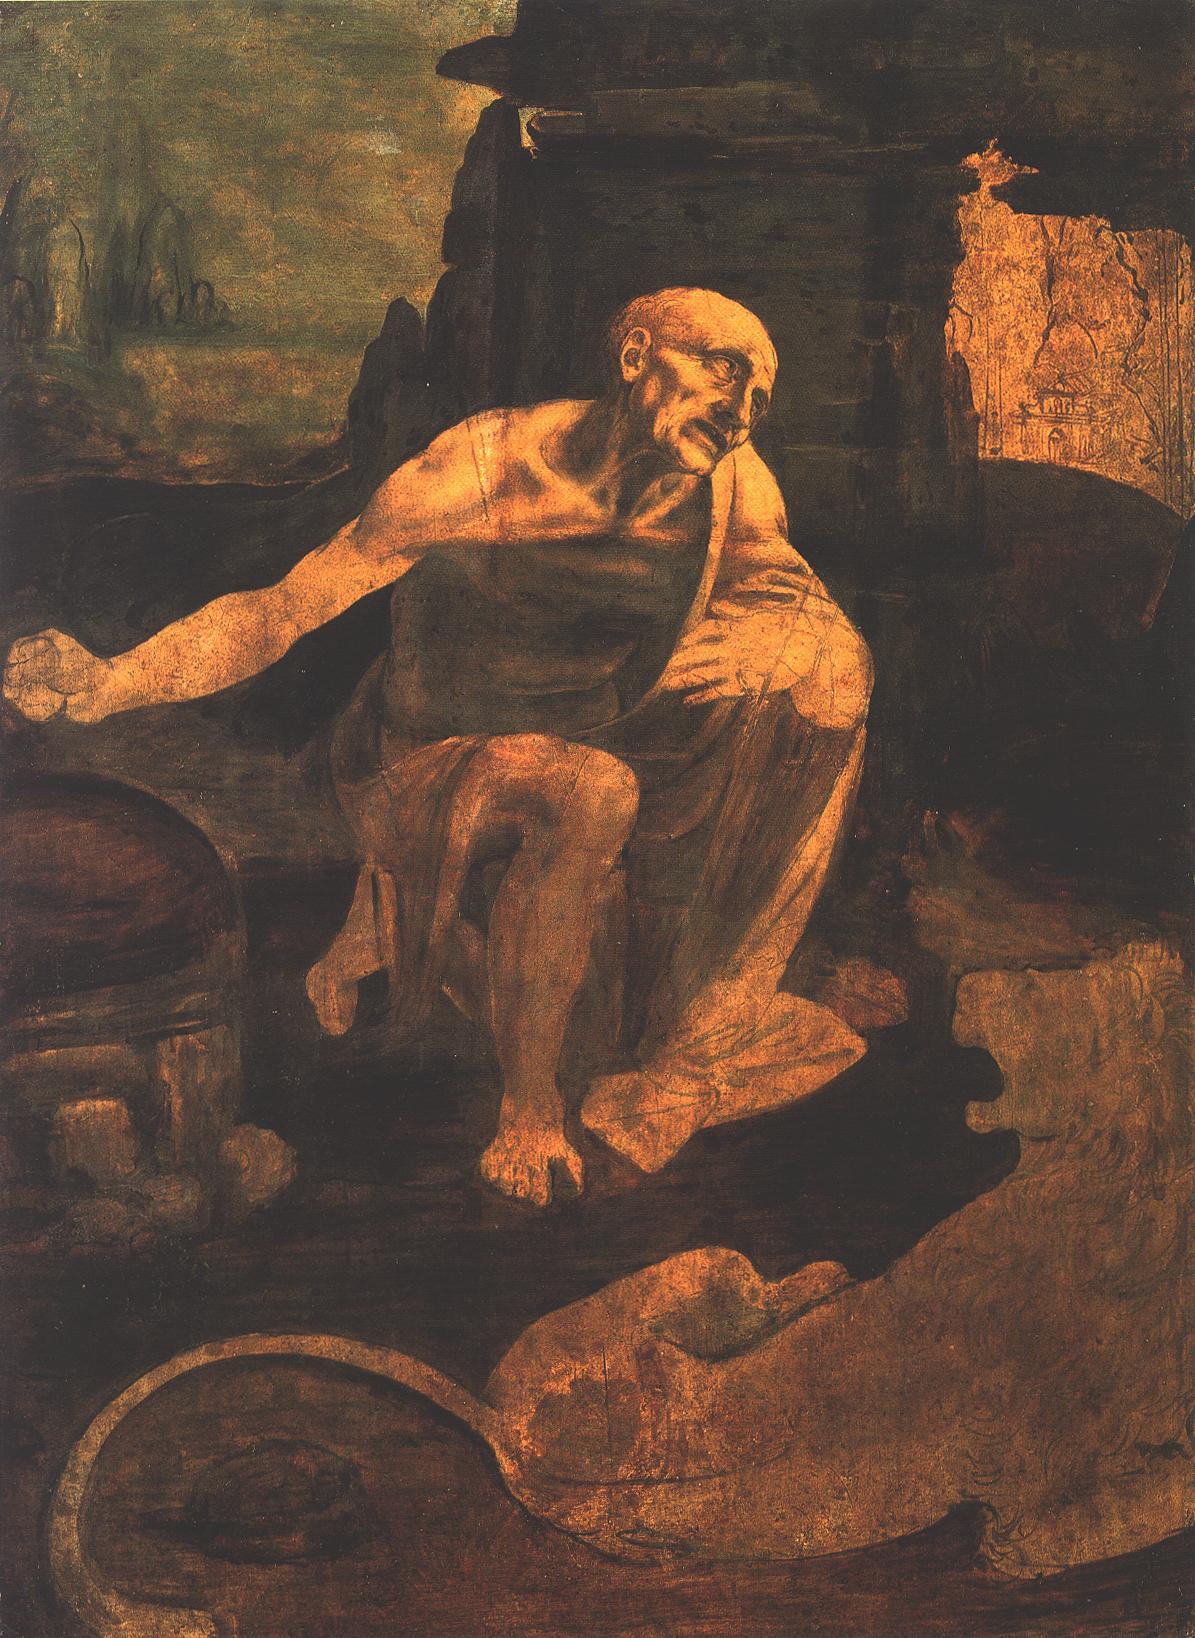 St Jerome in the Wilderness, Da Vinci